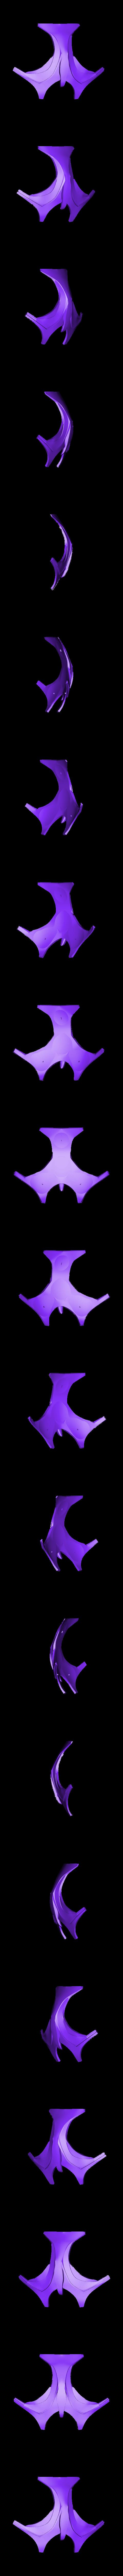 Bird_Emblem_v2.stl Download free STL file Battlestar Galactica Colonial Viper Pilot Helmet • 3D printing object, VillainousPropShop